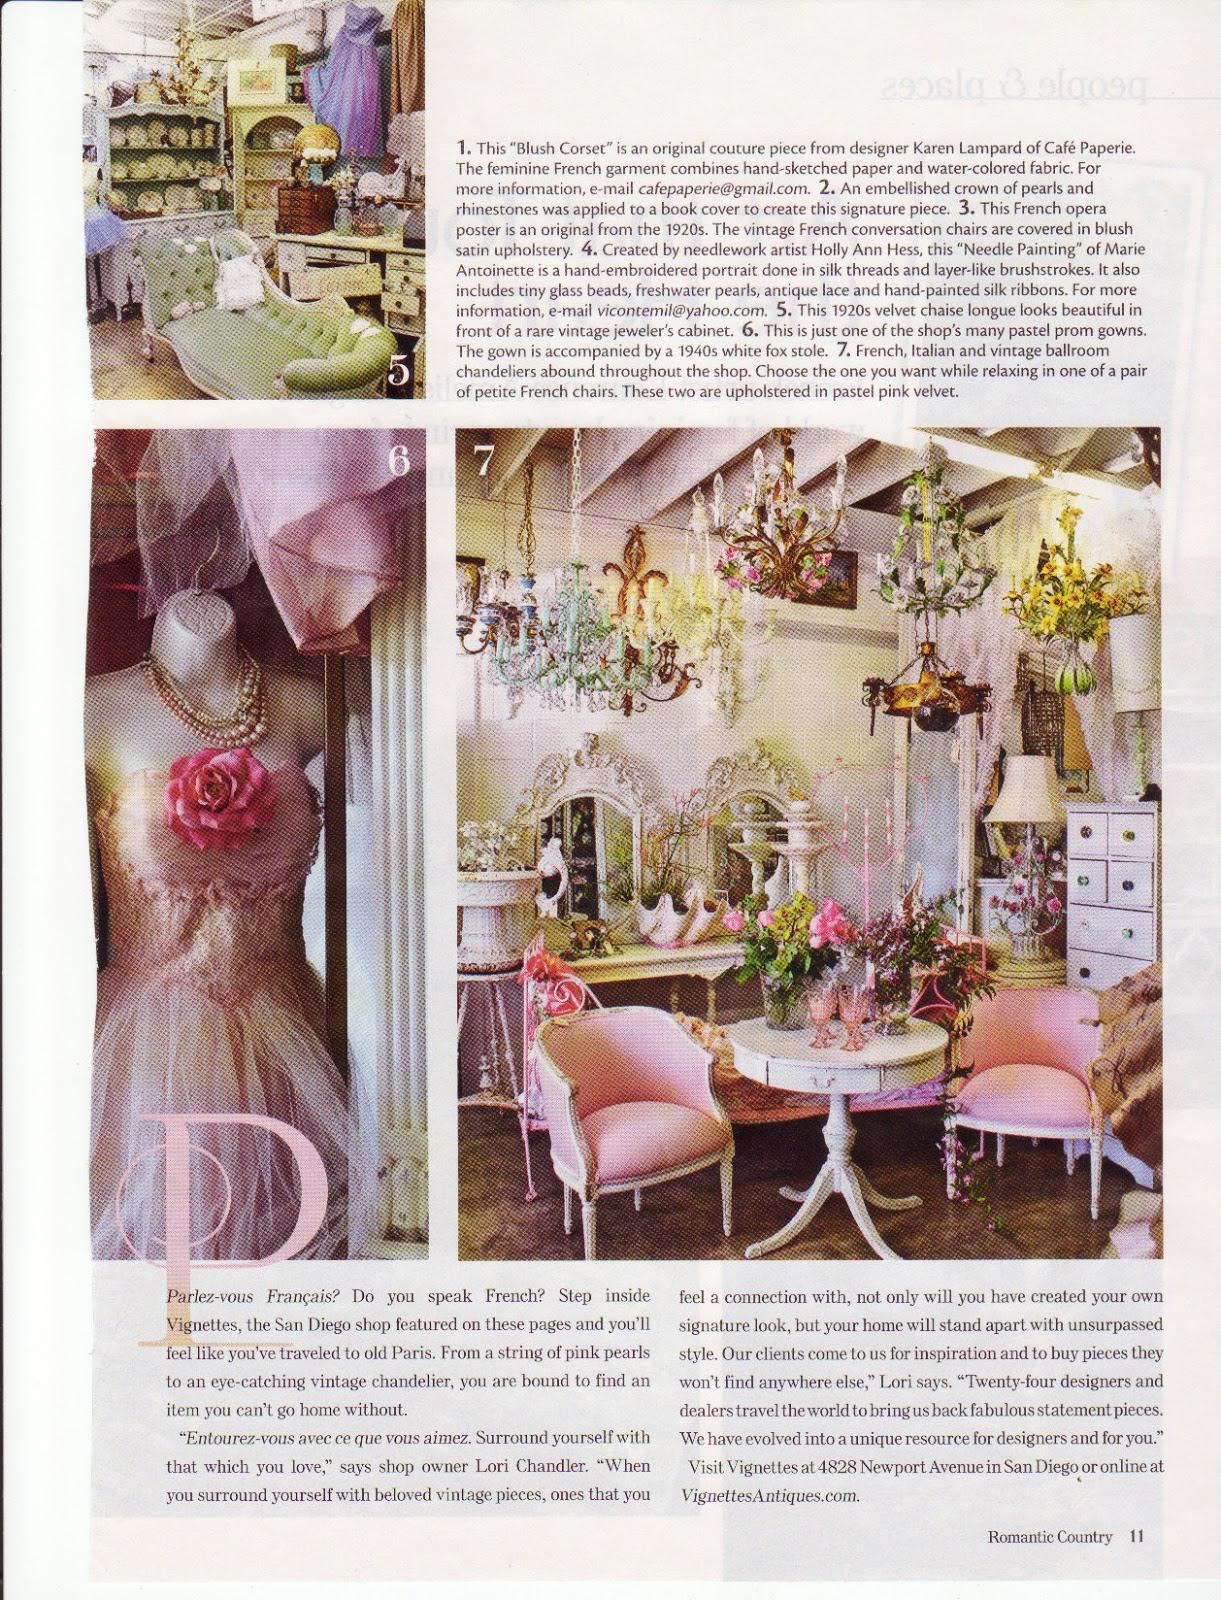 Vignettes Antiques: Merci ~ Romantic Country Magazine!